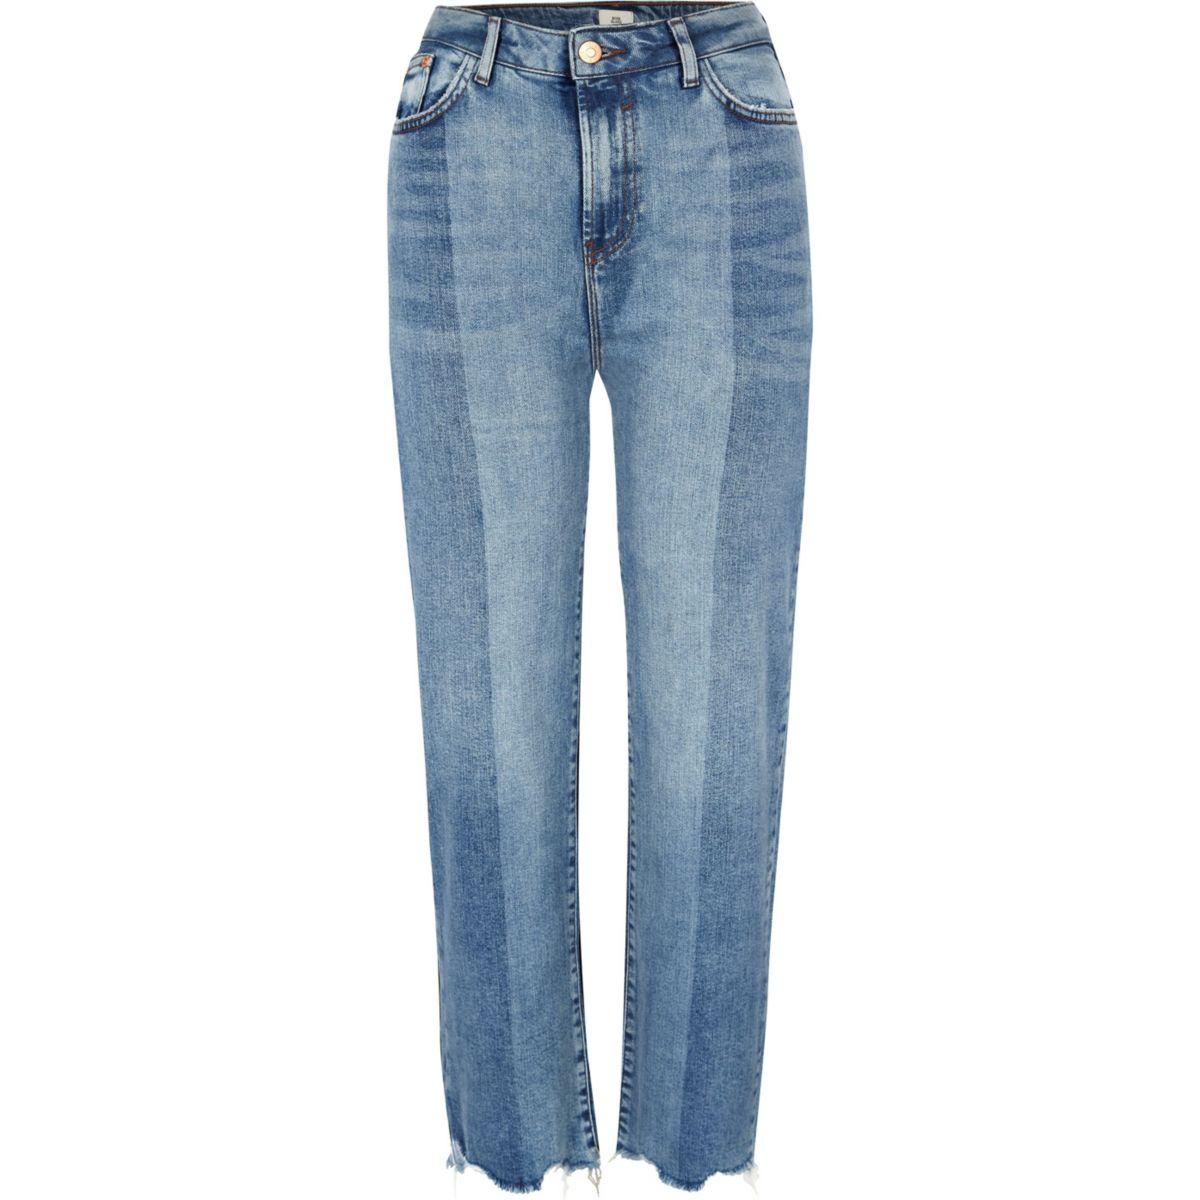 Mid Blue Bella Cut Hem Straight Leg Jeans by River Island